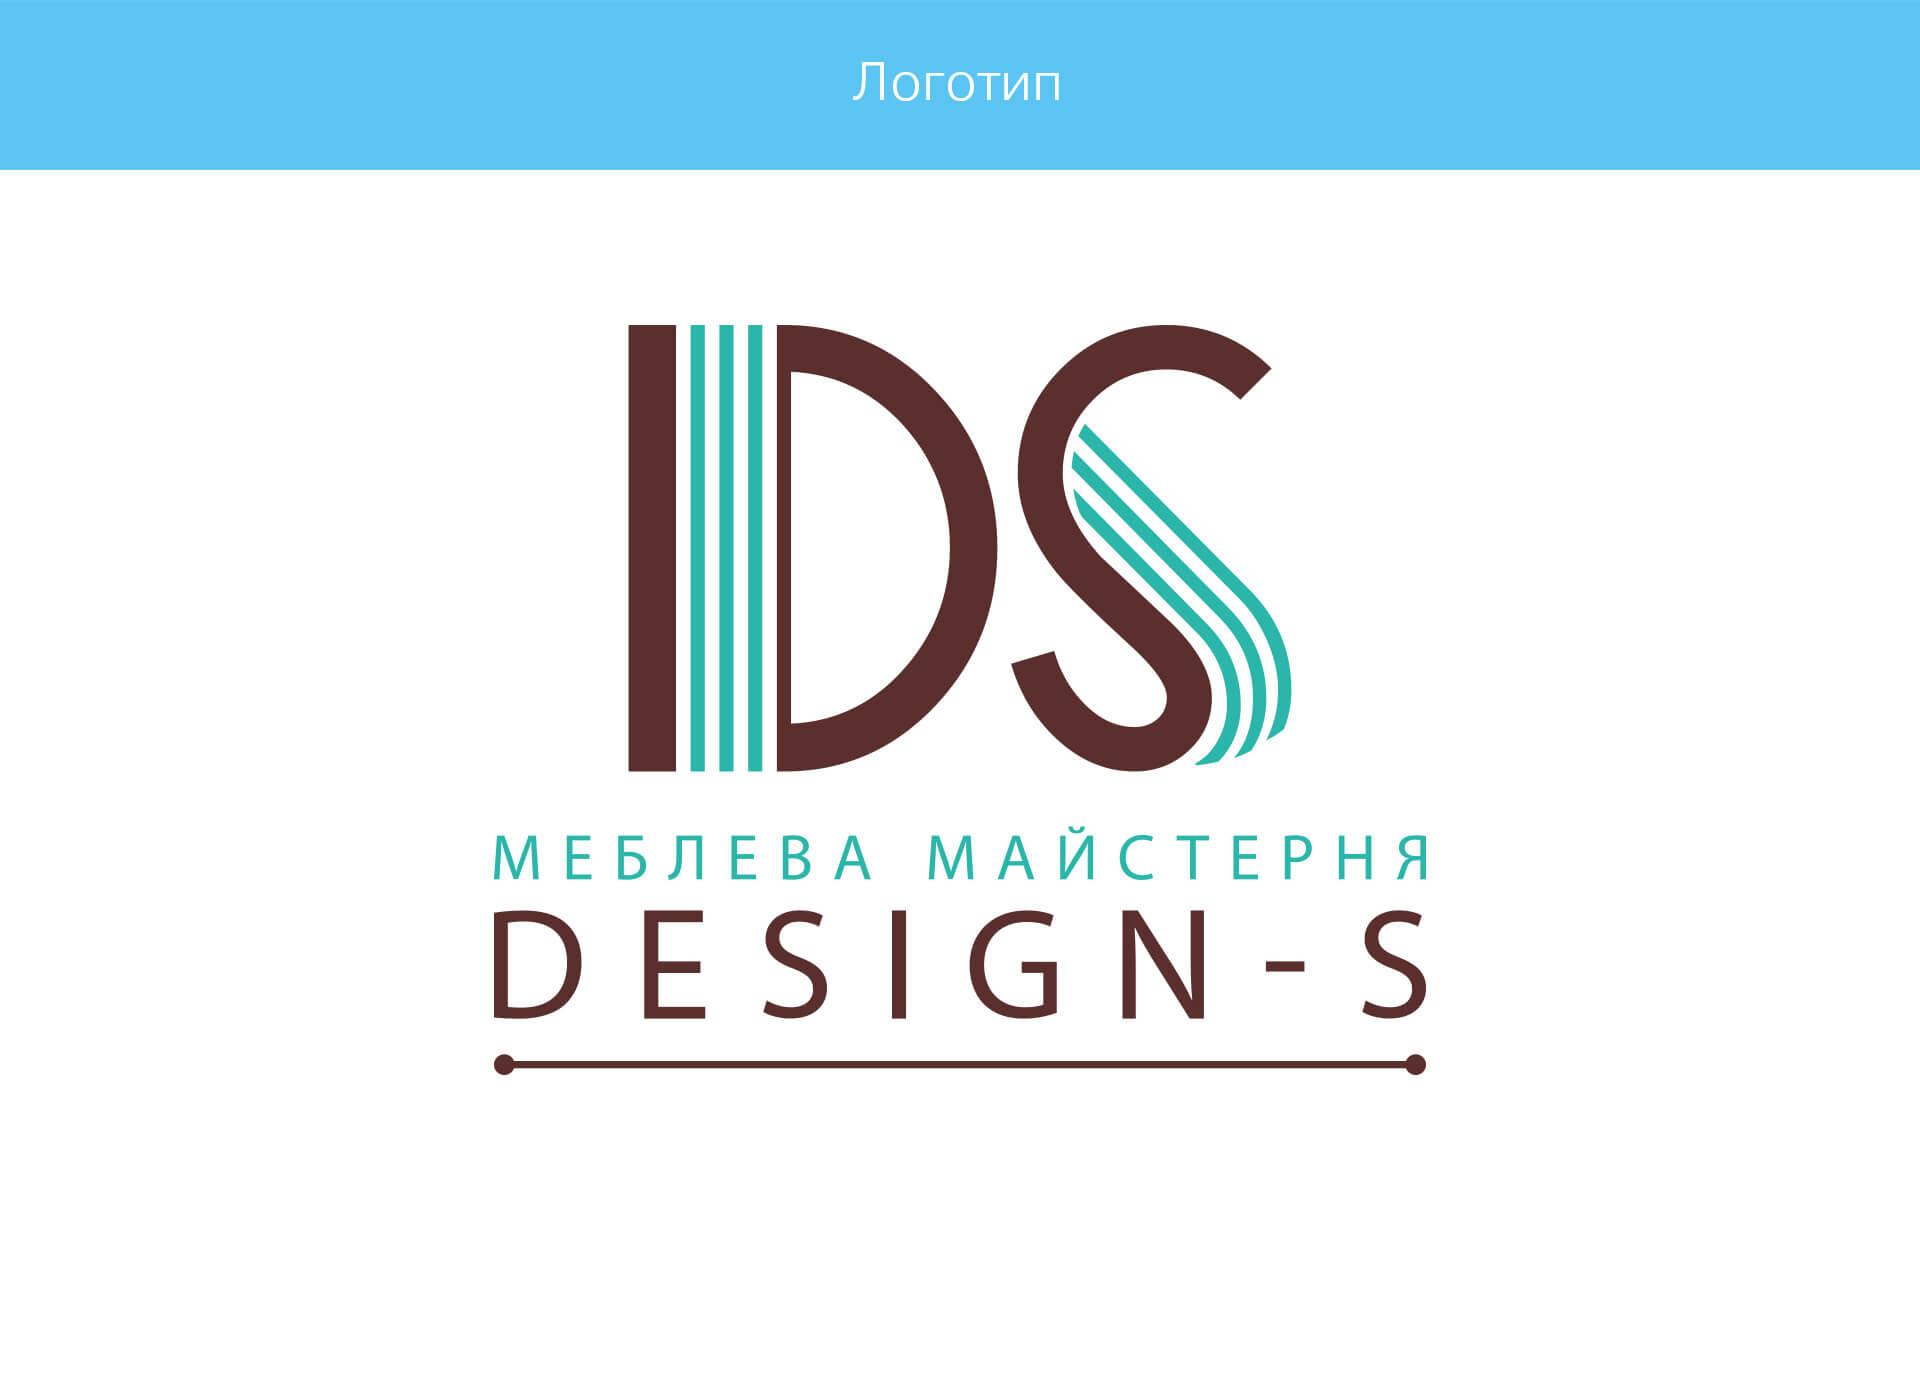 prokochuk_irina_design-s_1_